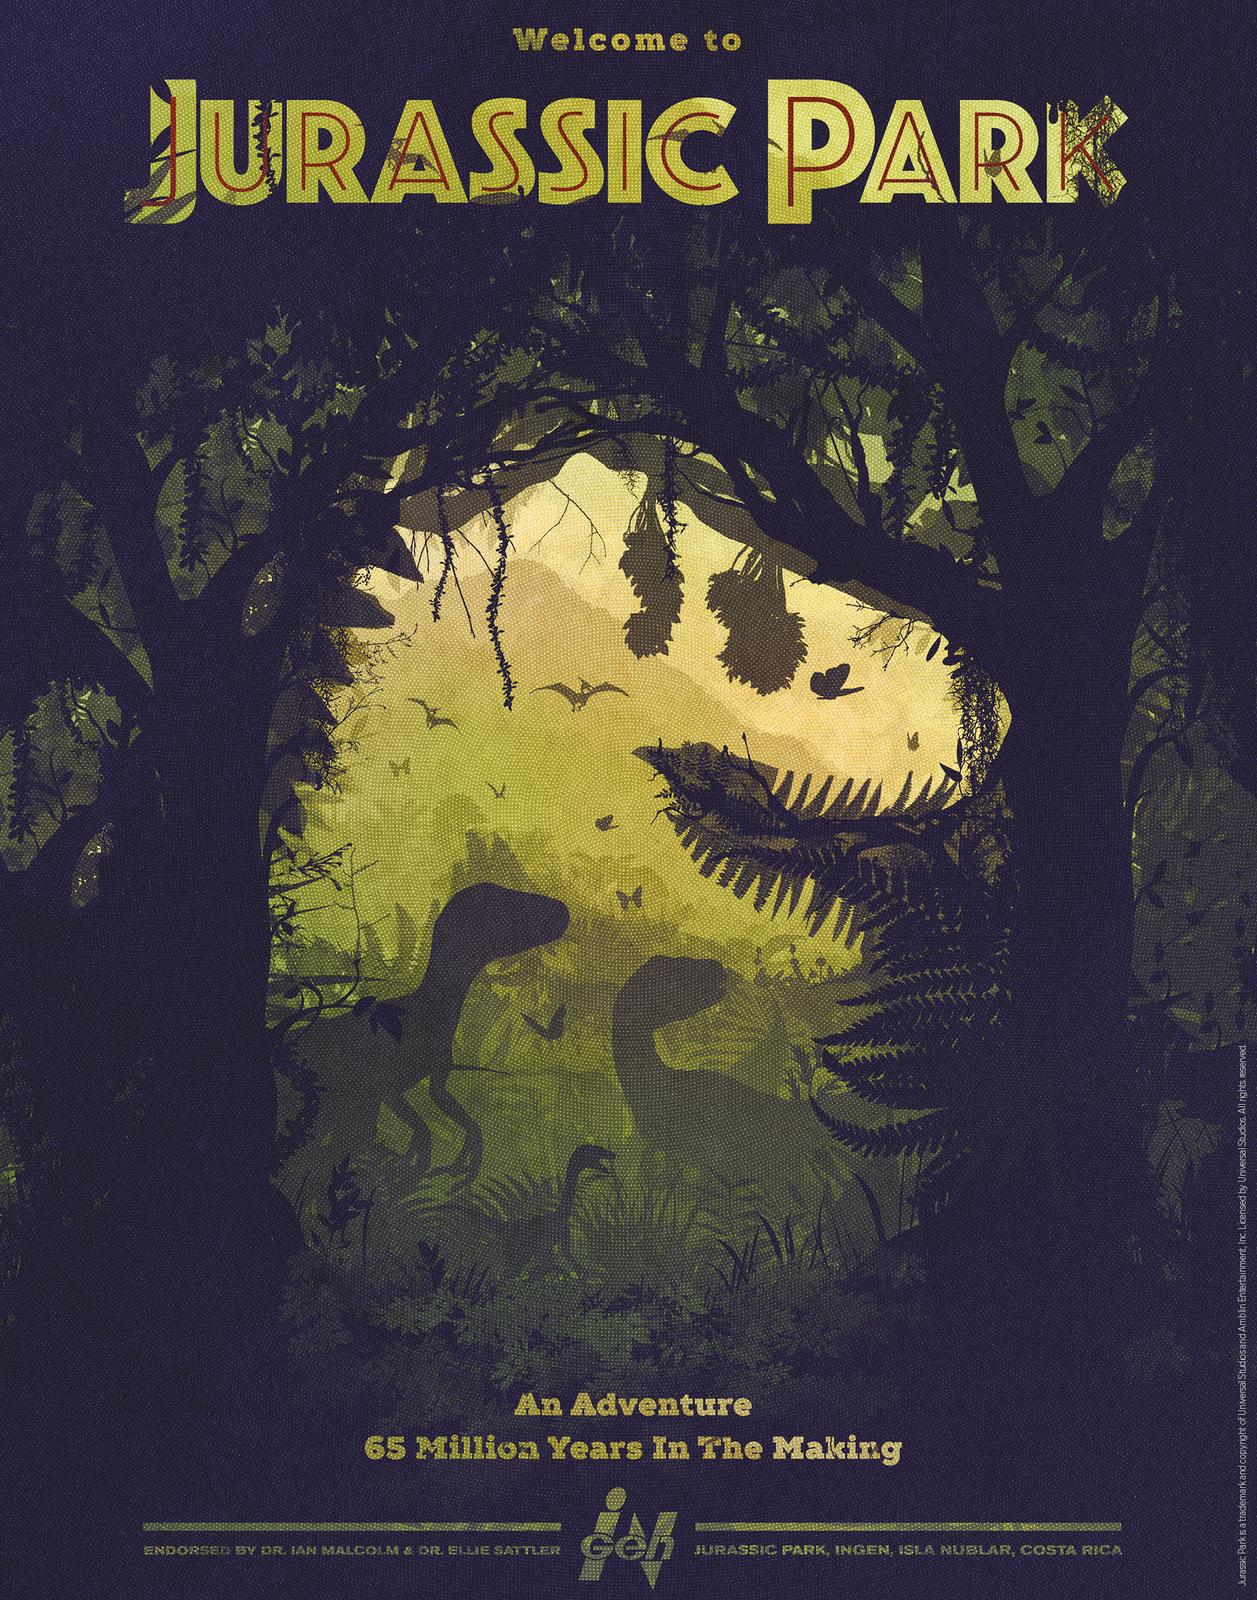 Jurassic Park: Premium Art Print - Silhouette image